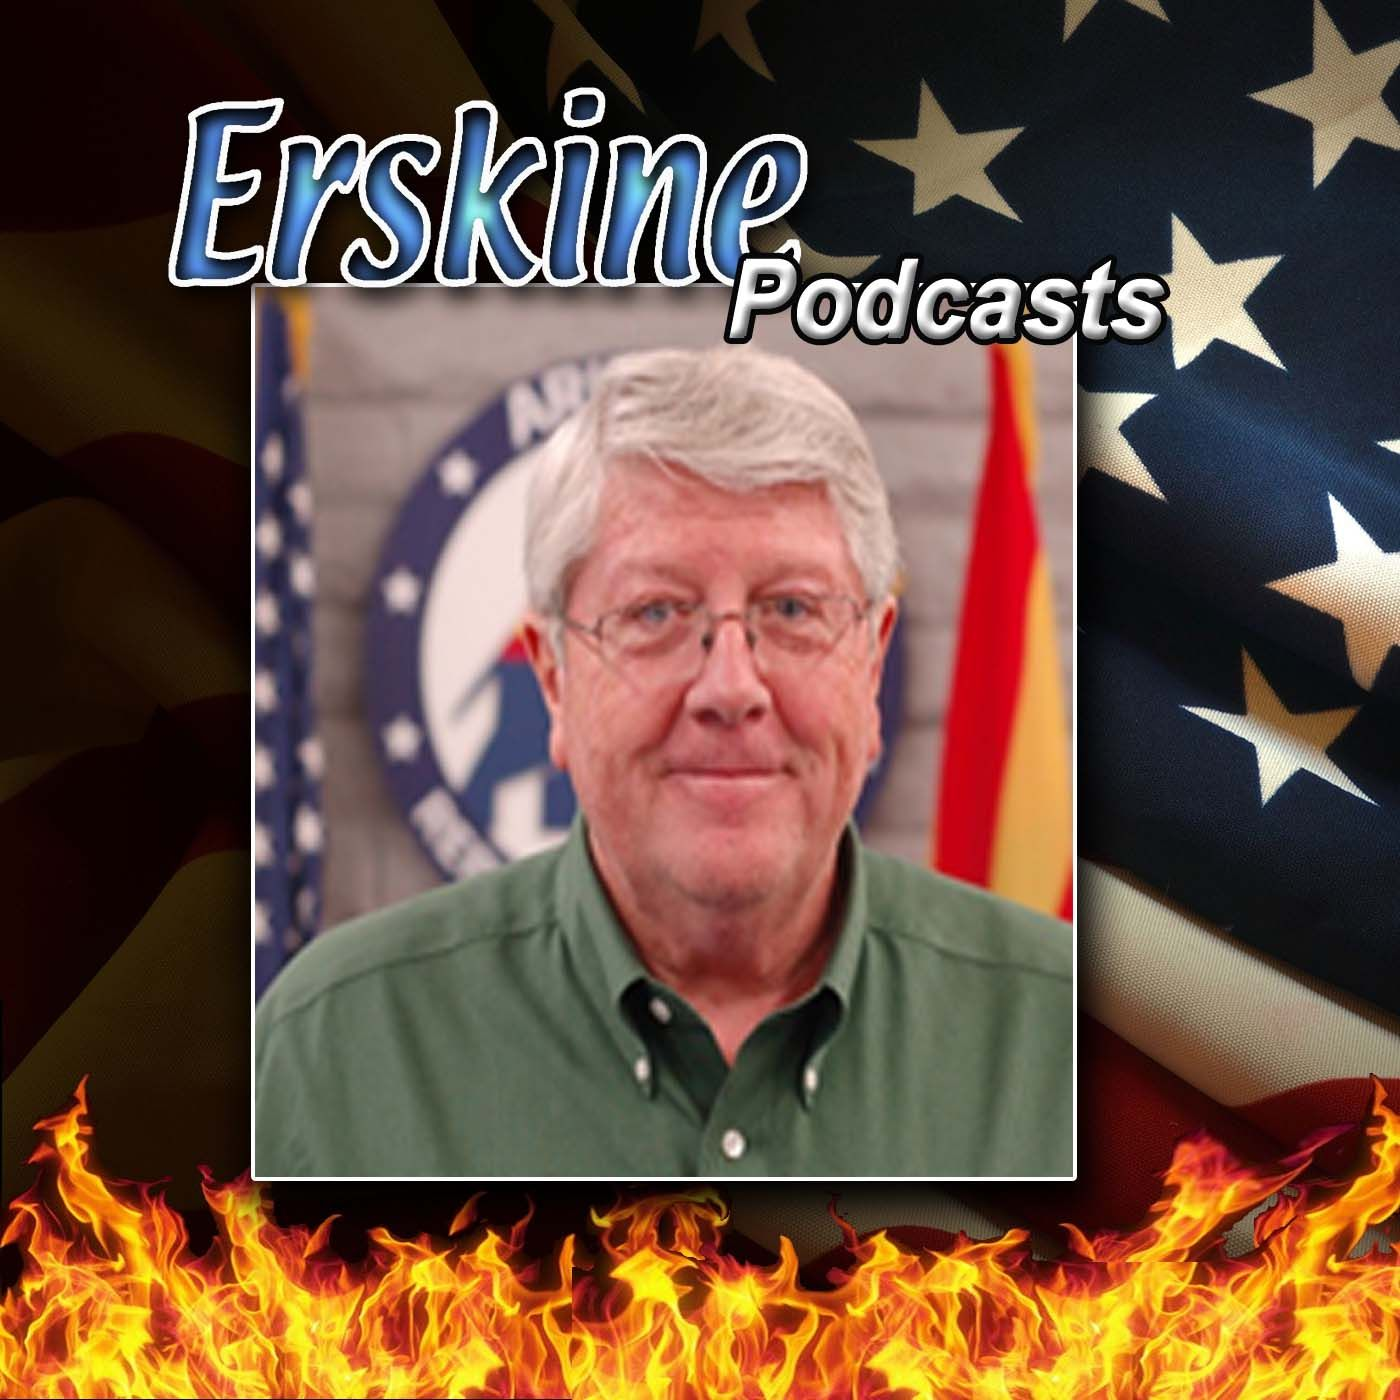 Jim O'Connor on Arizona Politics (ep#7-11-20)